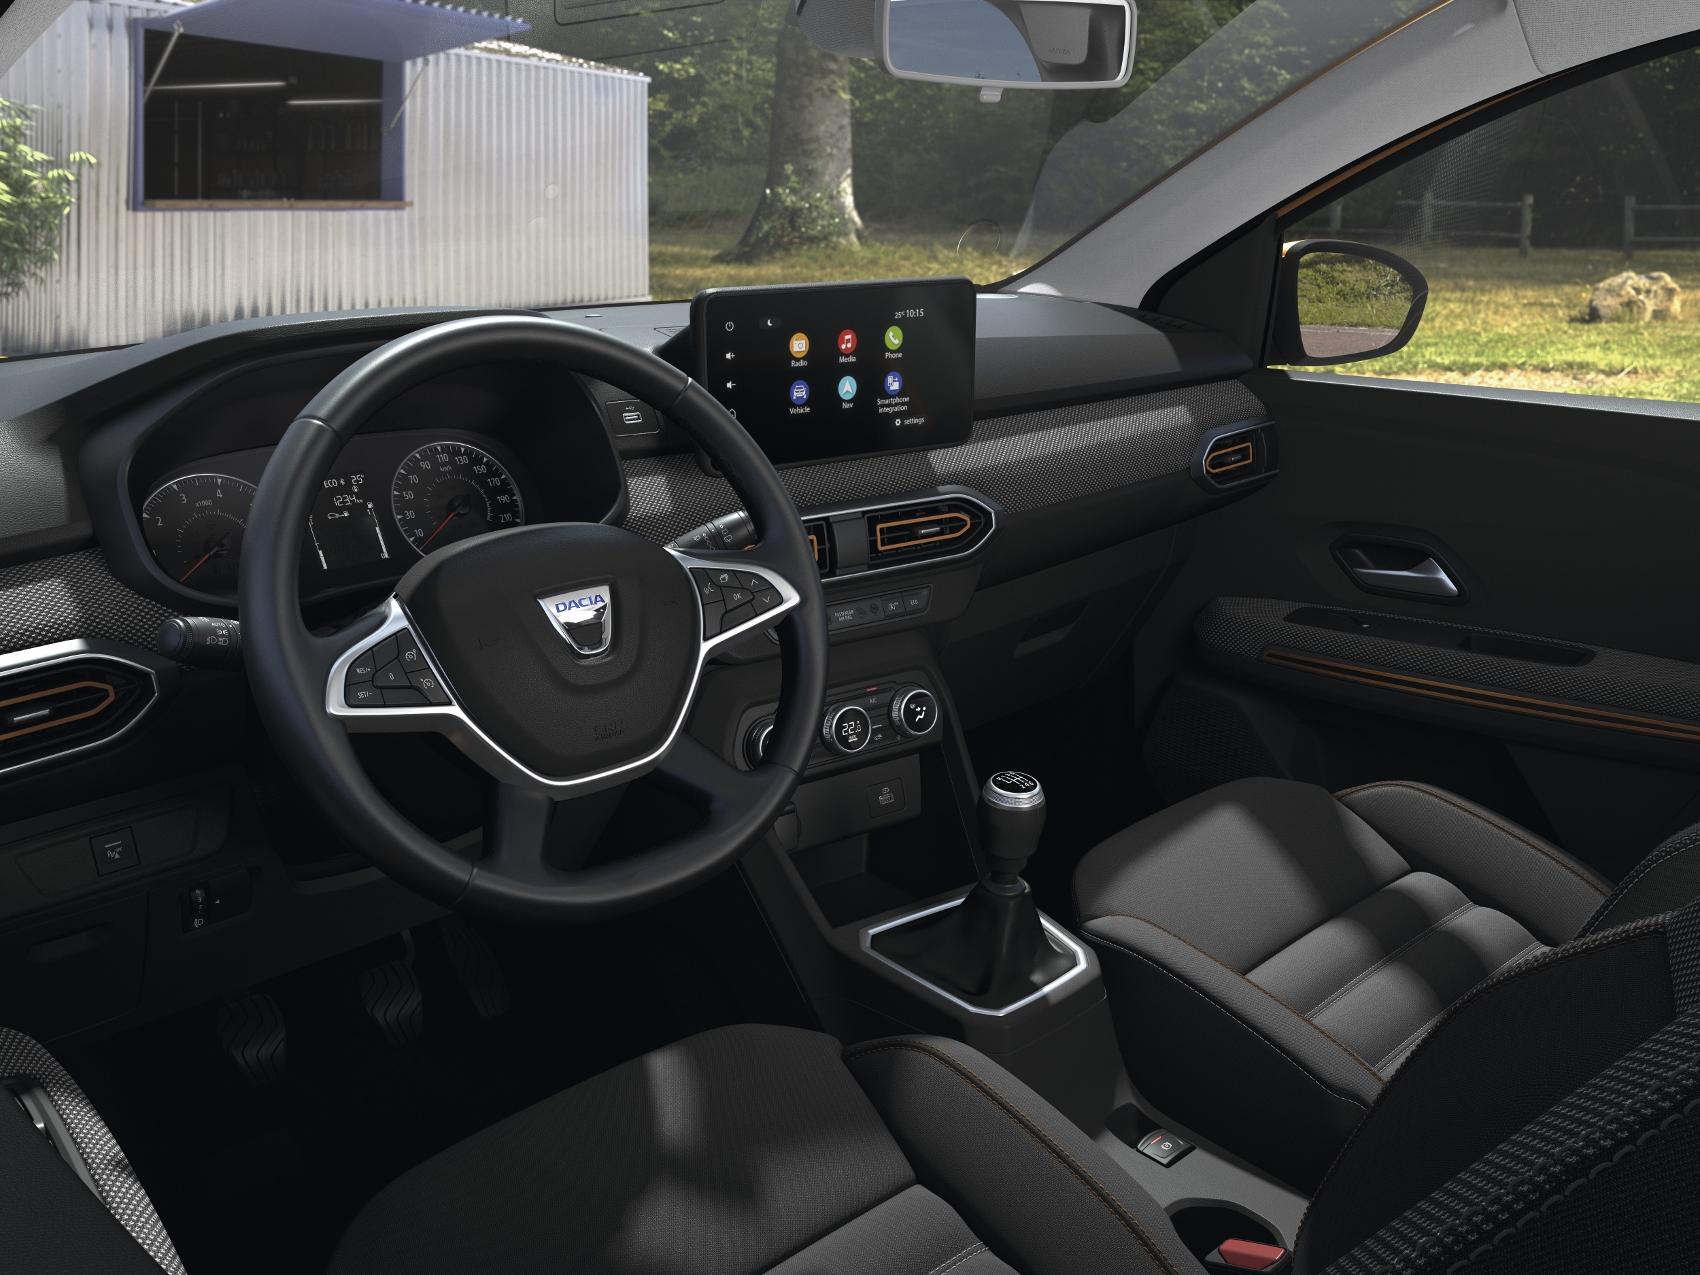 2020 - New Dacia SANDERO STEPWAY (1) (1700x1275)